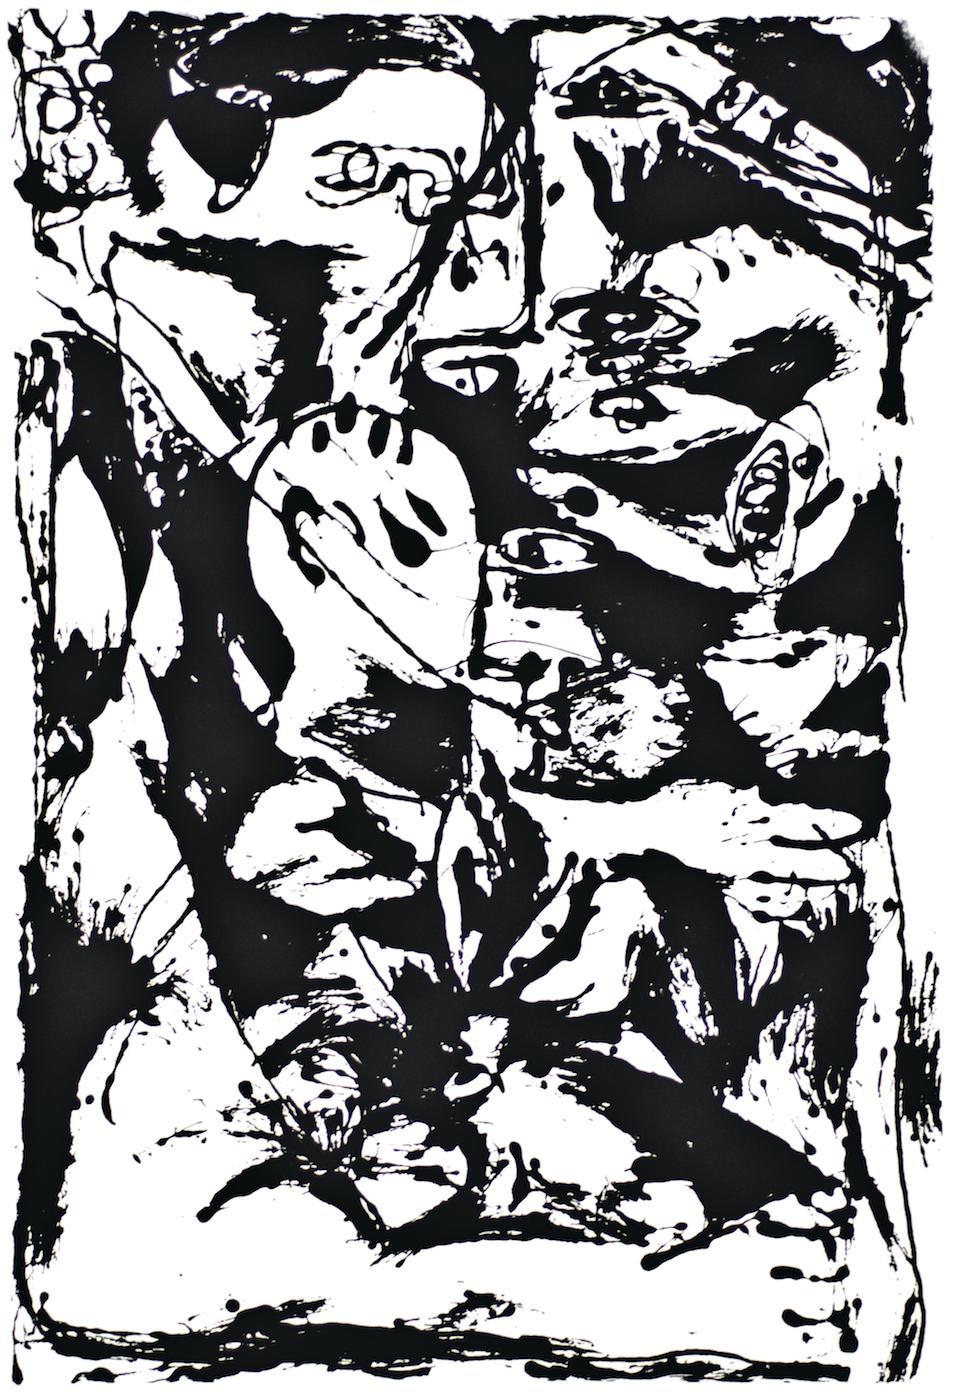 Untitled - Expression no. 2 - Original Serigraph After Jackson Pollock - 1964